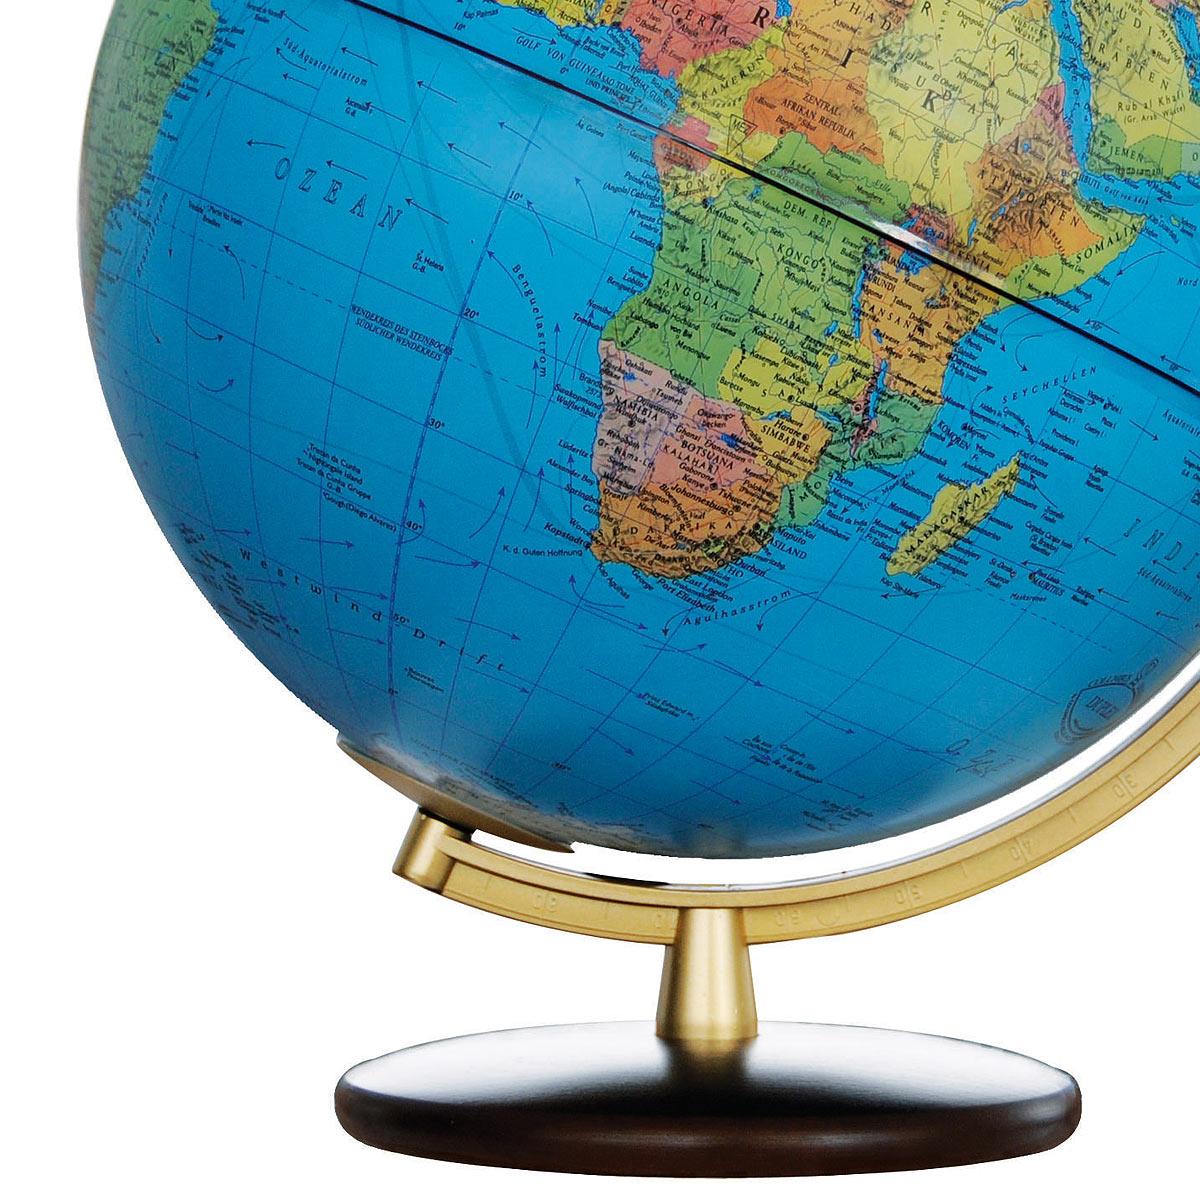 b24f64b8bc1c90 ... Preview  Desk Globe Columbus Duplex Ø 30 cm   12 inch